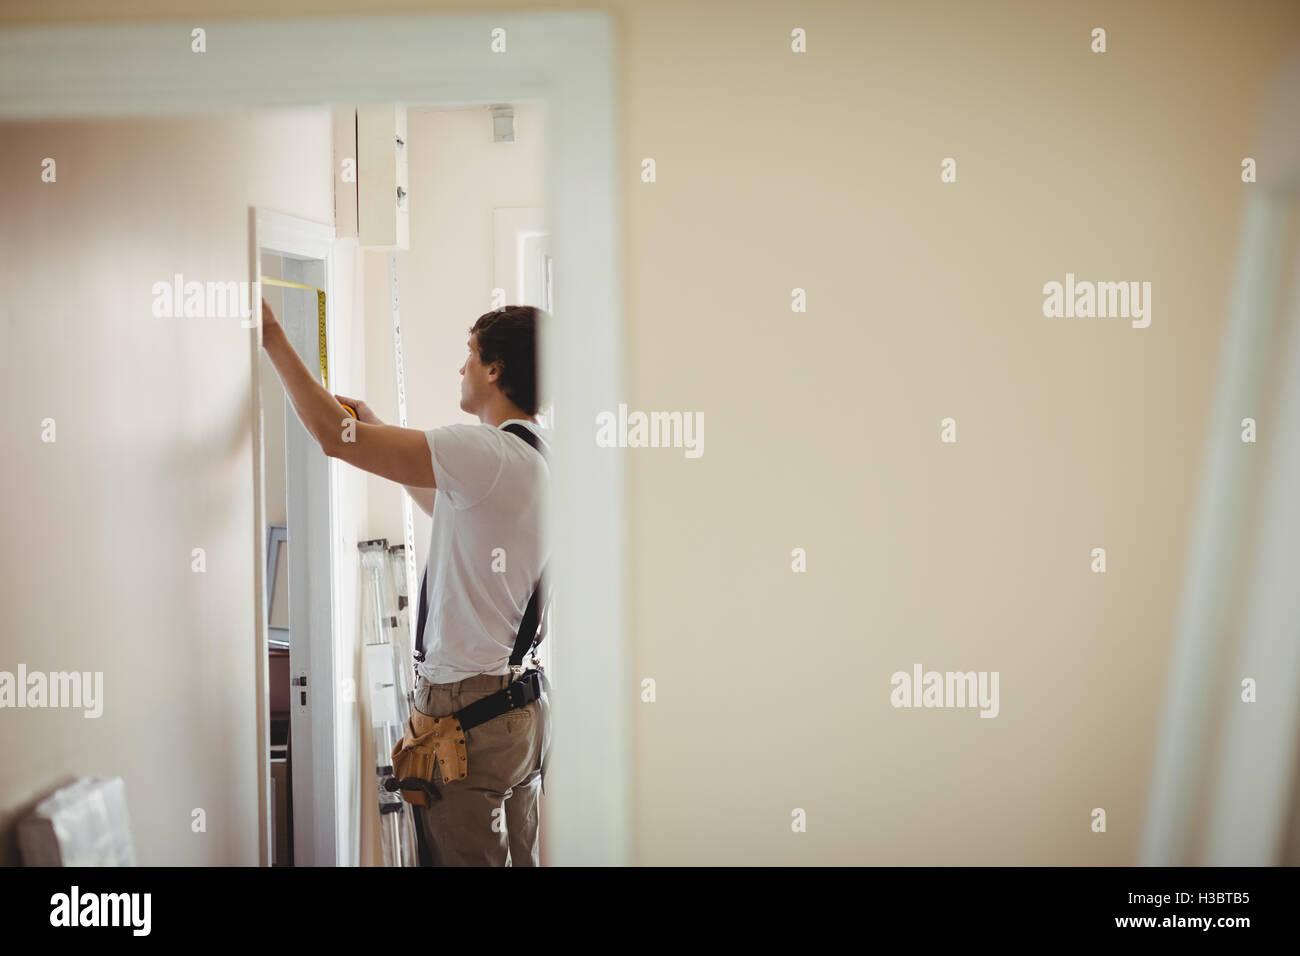 Carpenter measuring a door frame Stock Photo: 122577145 - Alamy